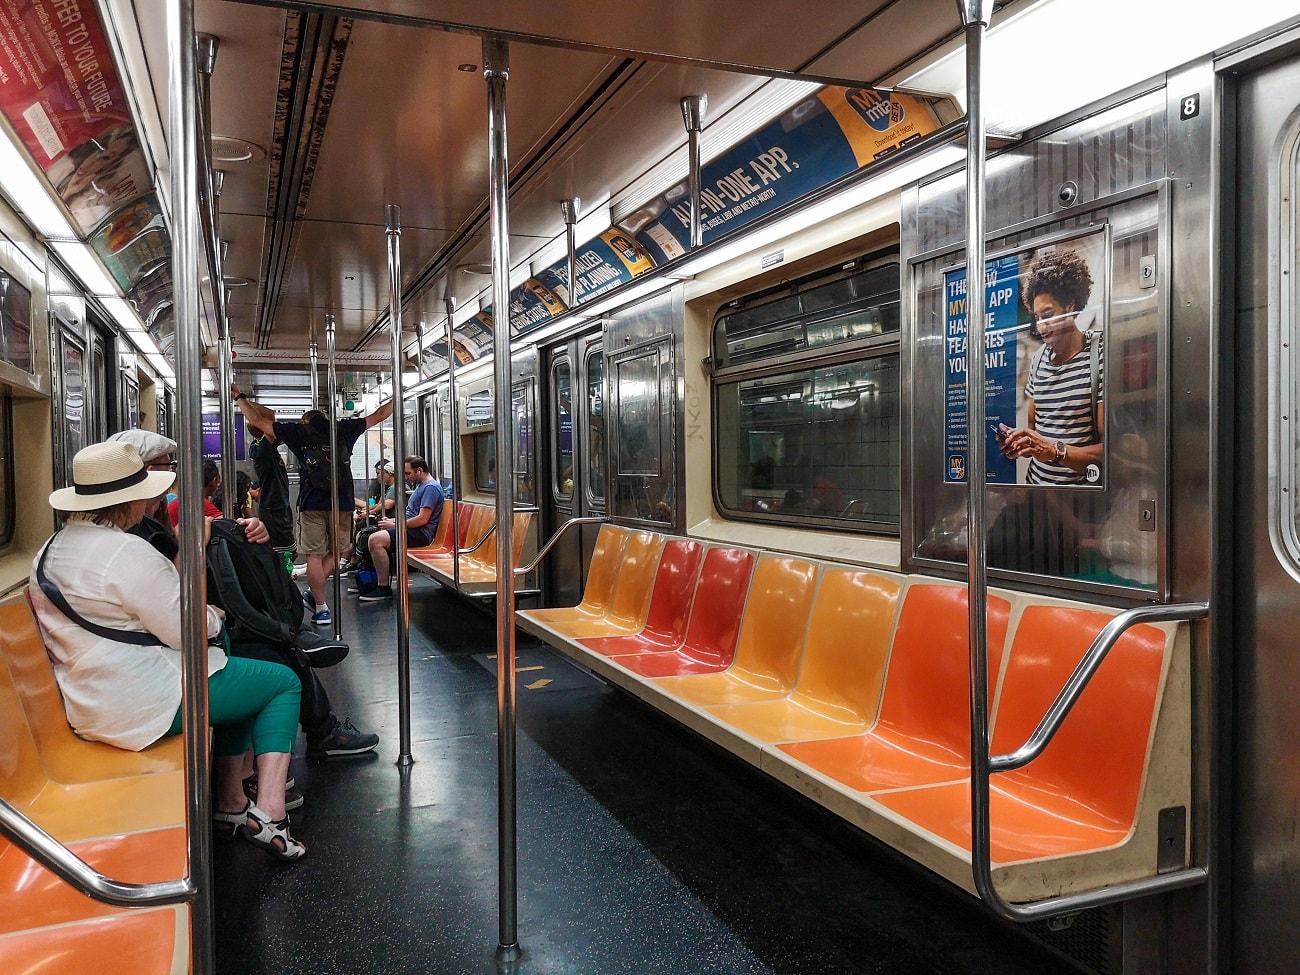 Metro New York, public transport New York, JFK to Manhattan